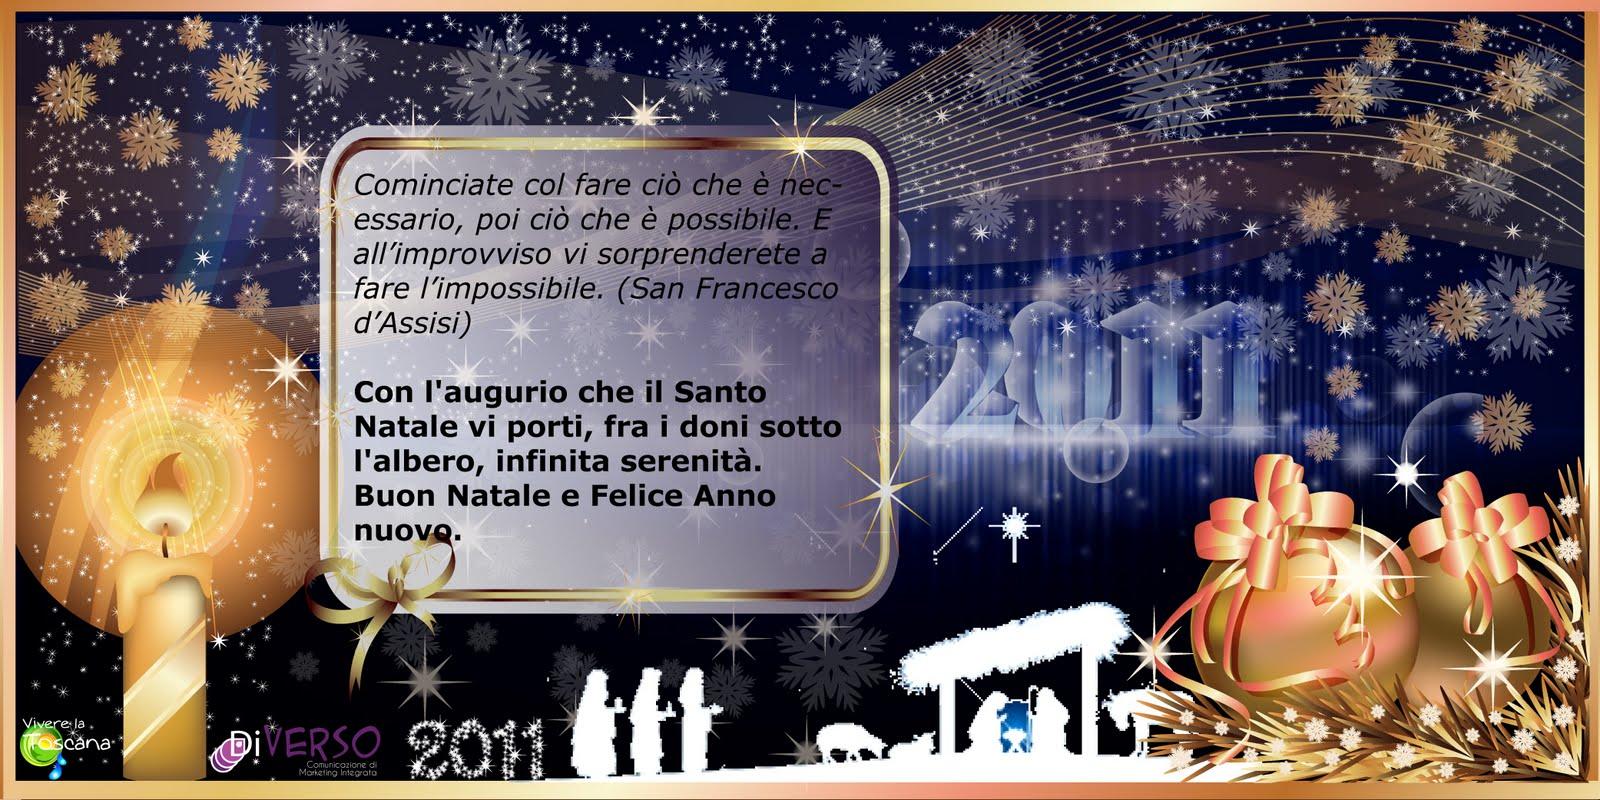 Auguri Natale 2011 Vivere La Toscana